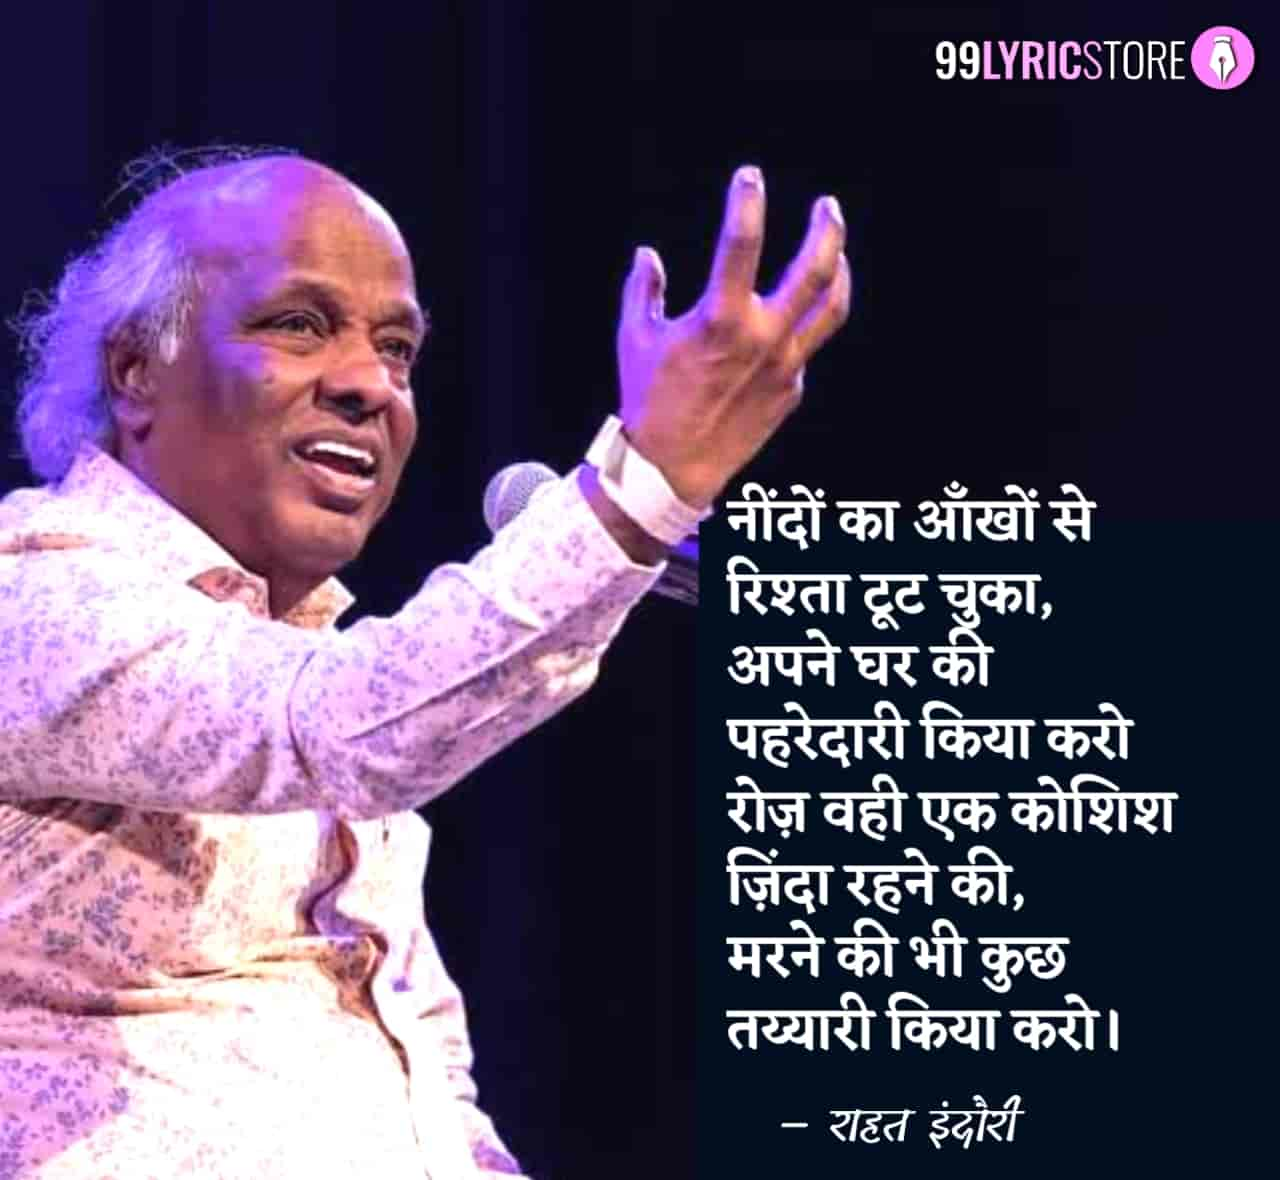 This Beautiful Shayari 'Apne Ghar Ki Pehredaari Kiya Karo' which is written and performed by Famous legend Shayar Dr. Rahat Indori.